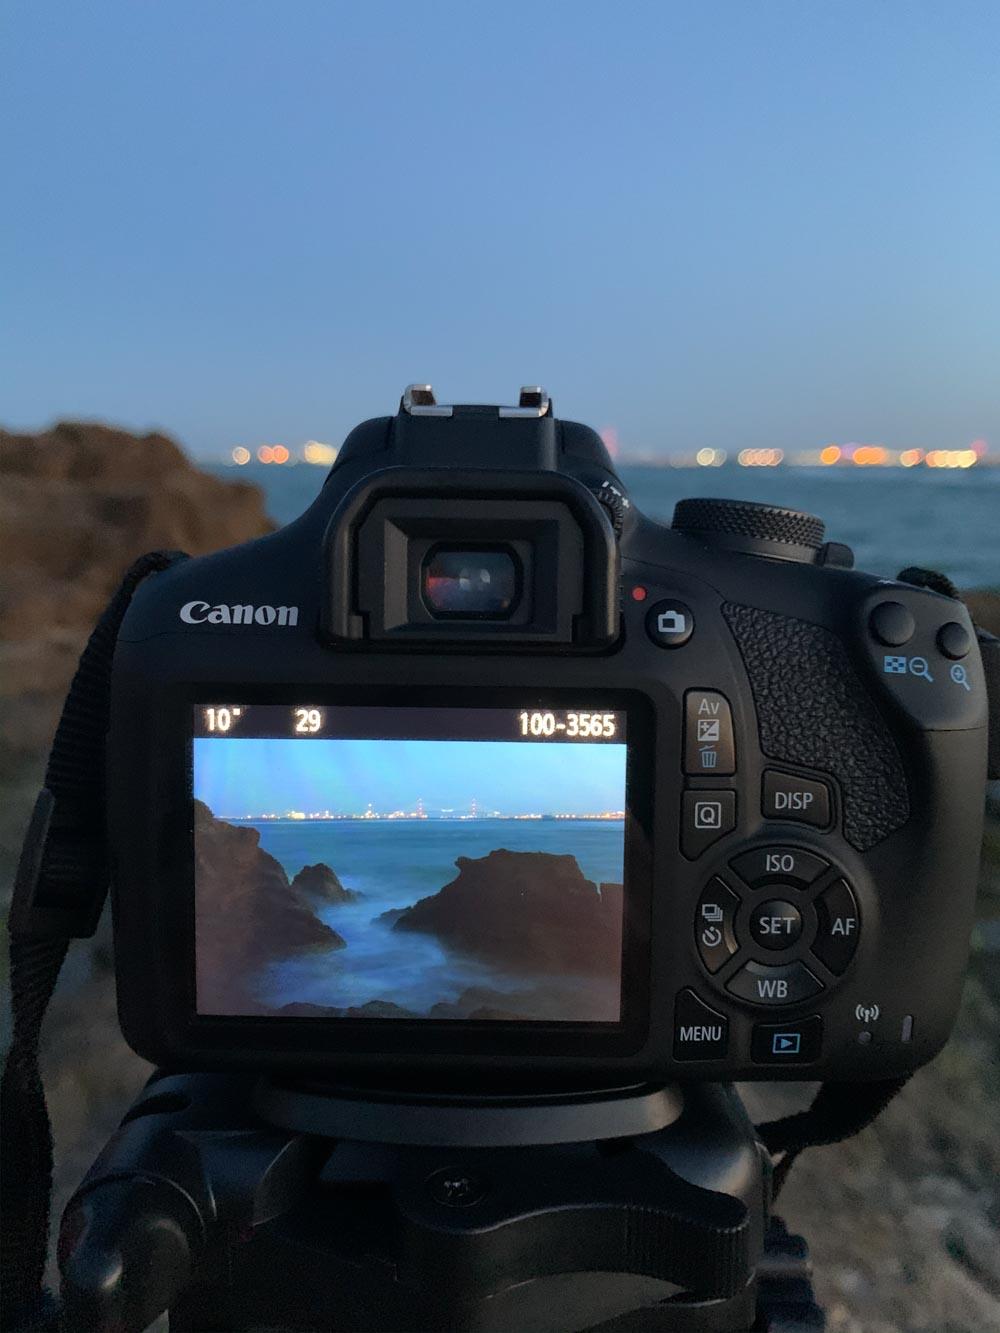 Clases de Fotografía en Cádiz